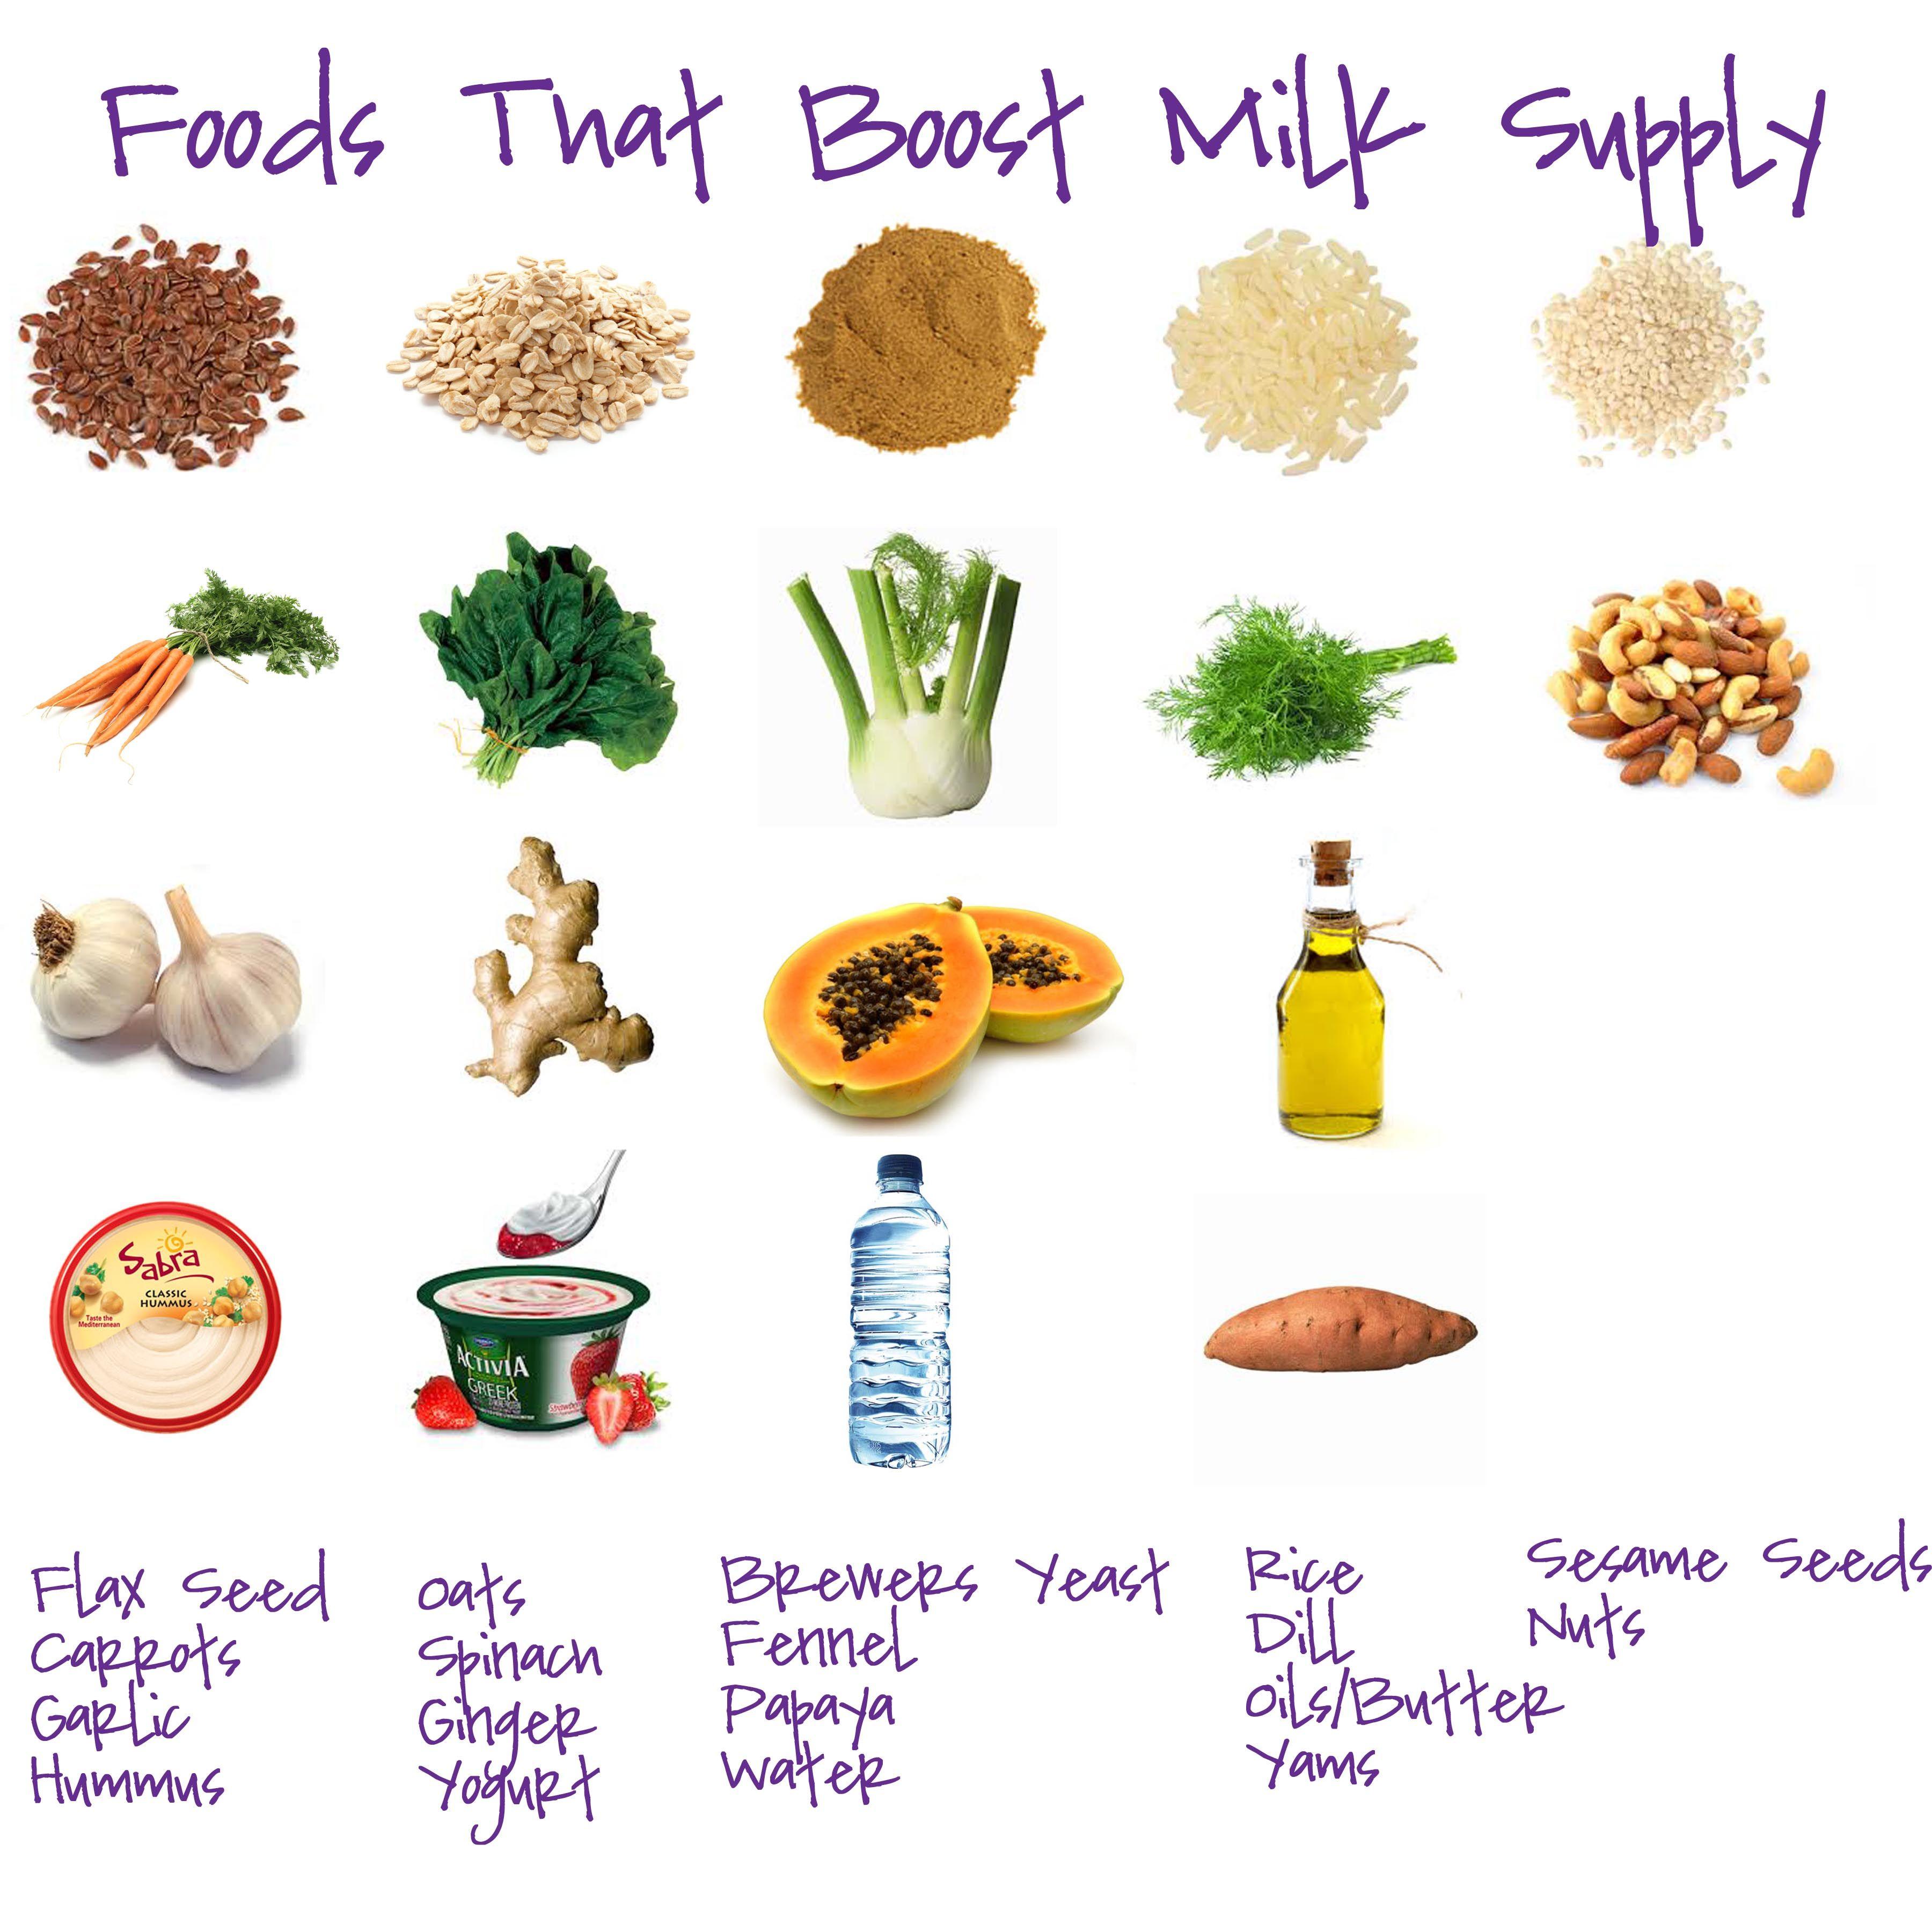 good breast milk supply